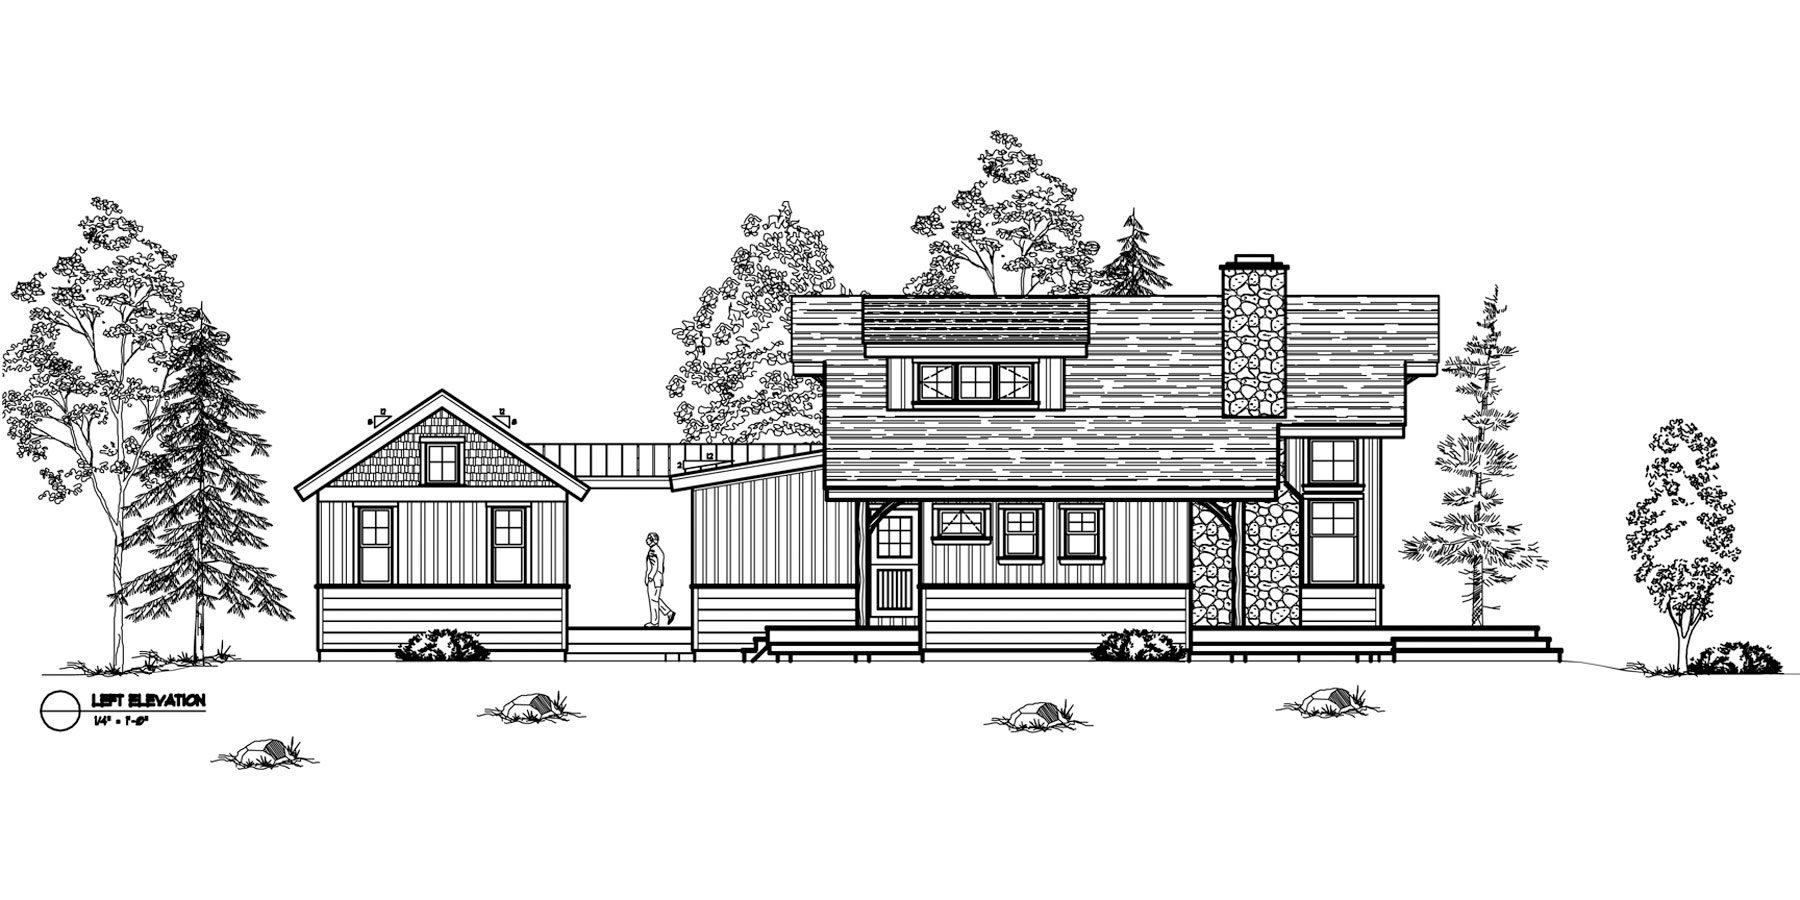 Normerica Timber Frames, House Plan, The Ranger 3575, Left Elevation